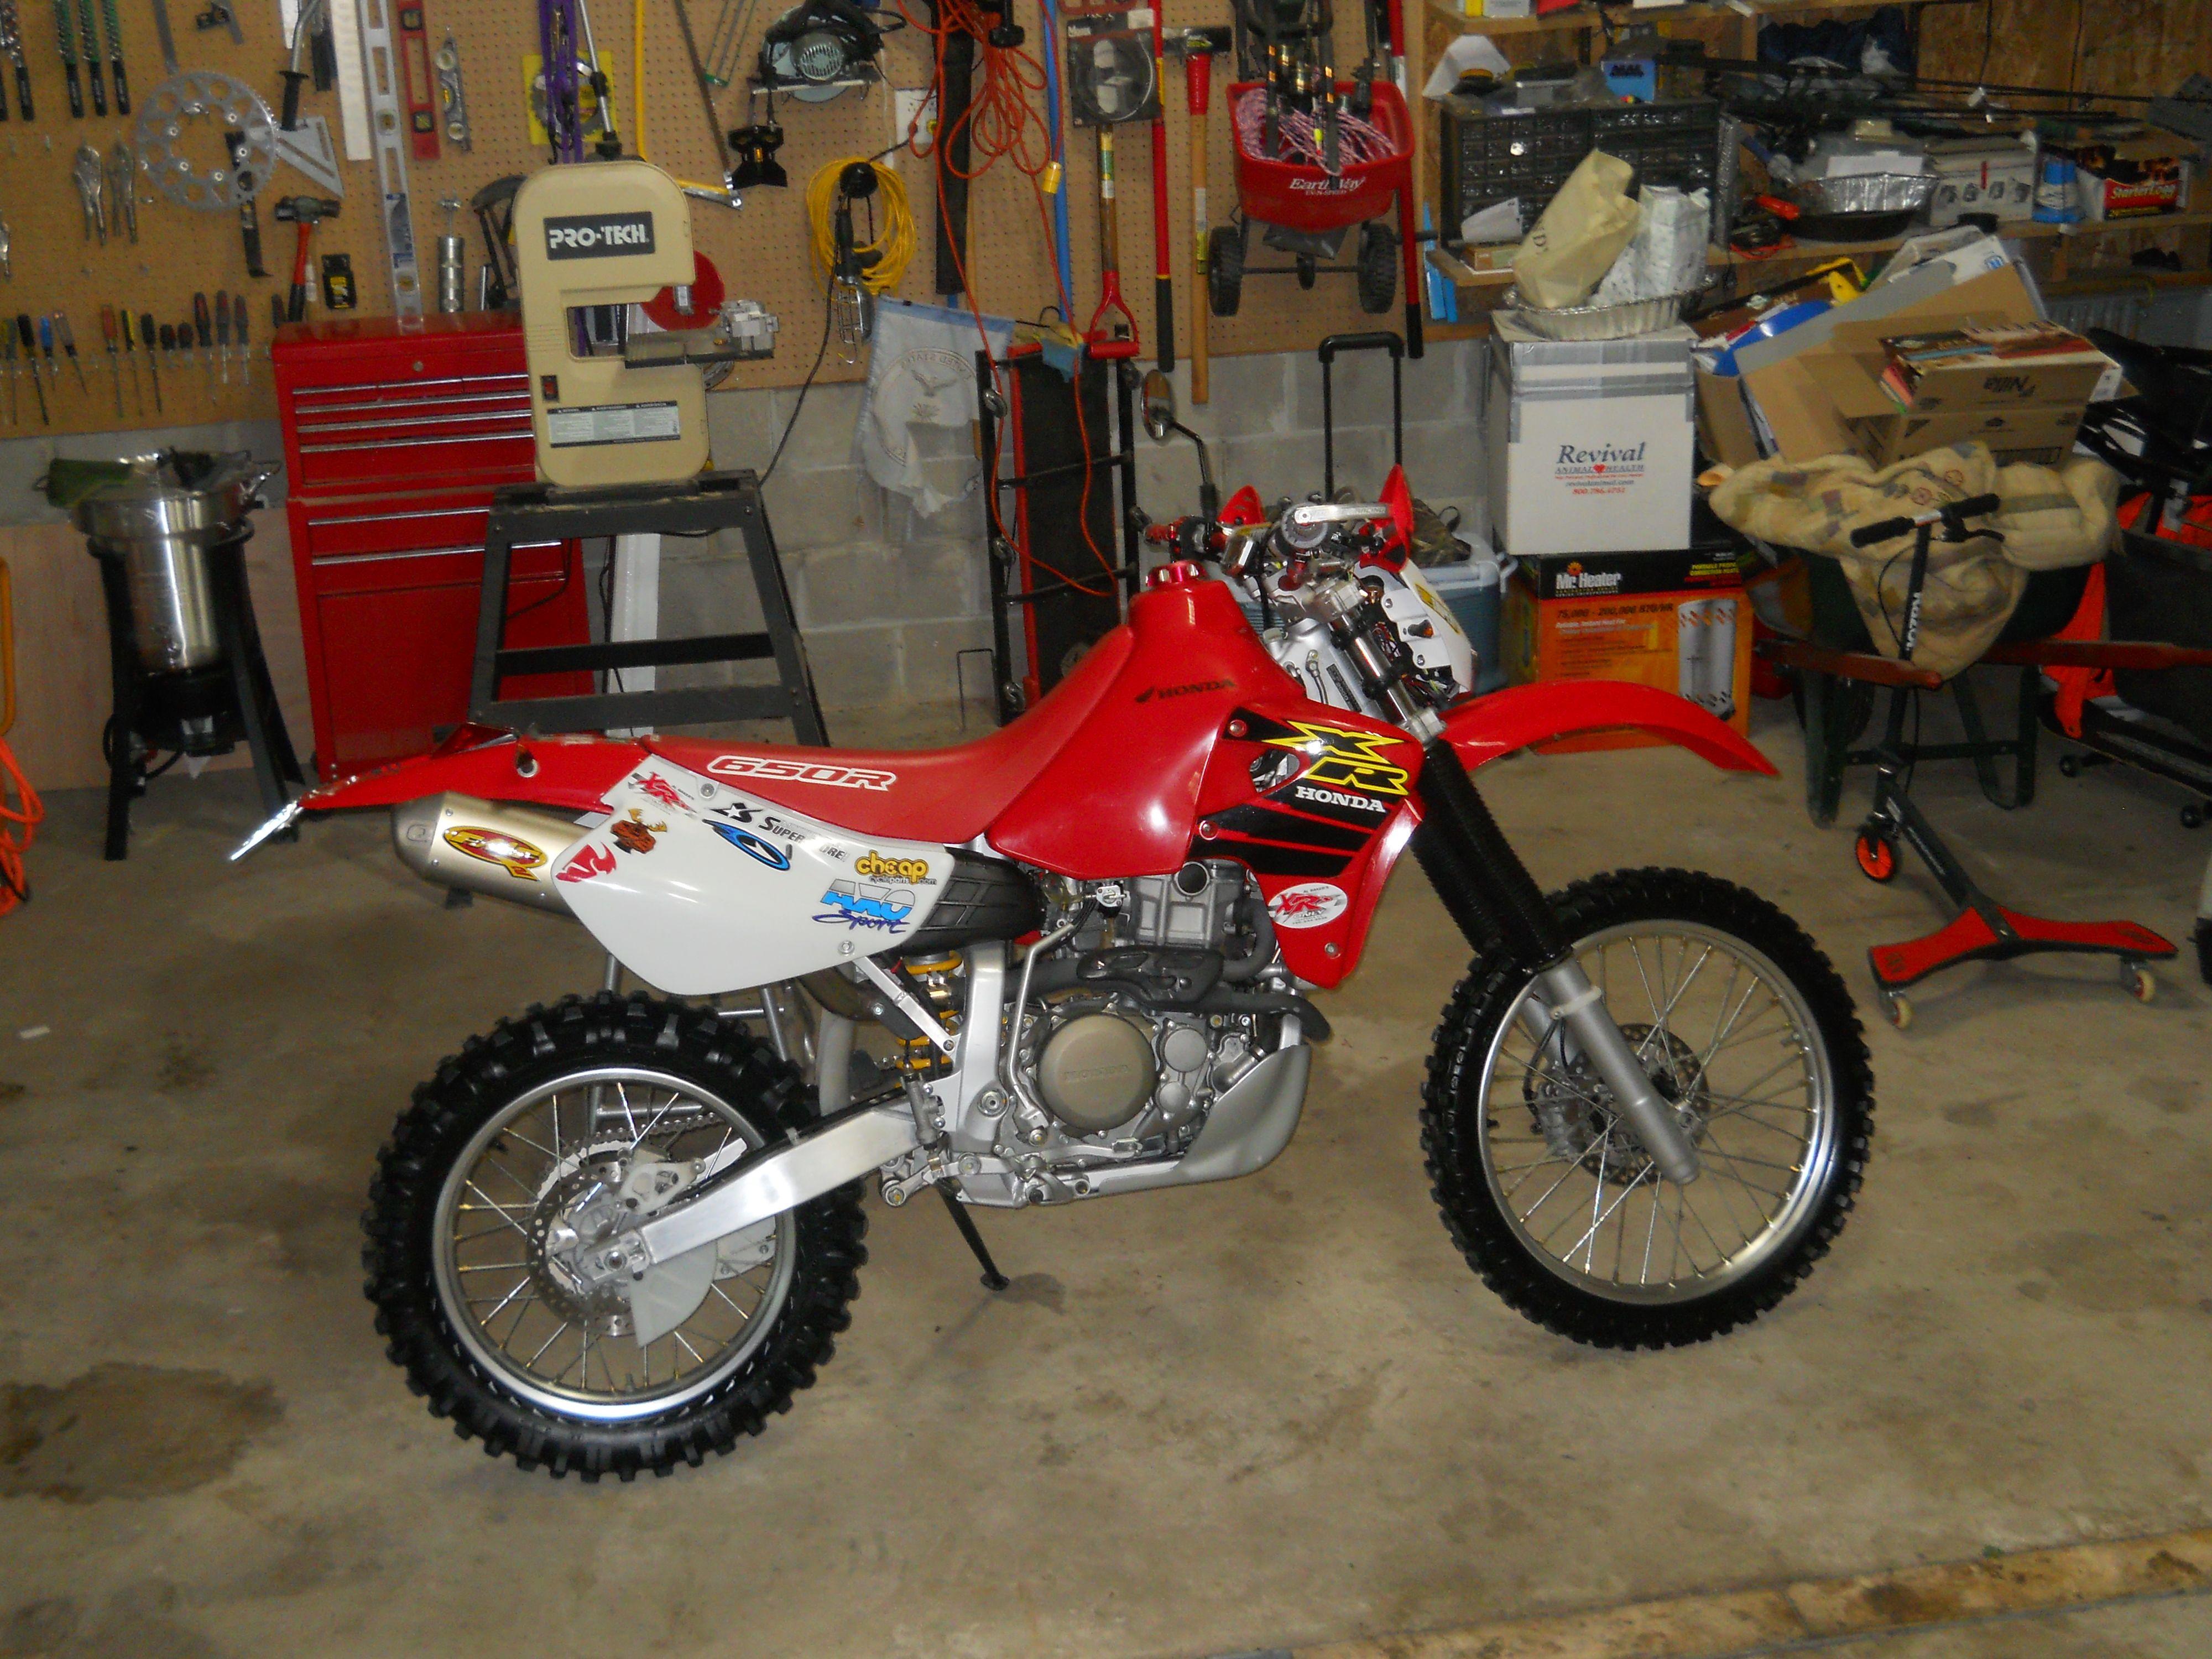 My 2000 Honda Xr650r Brp Awesome Bike Youth Dirt Bikes Adventure Bike Dual Sport Motorcycle